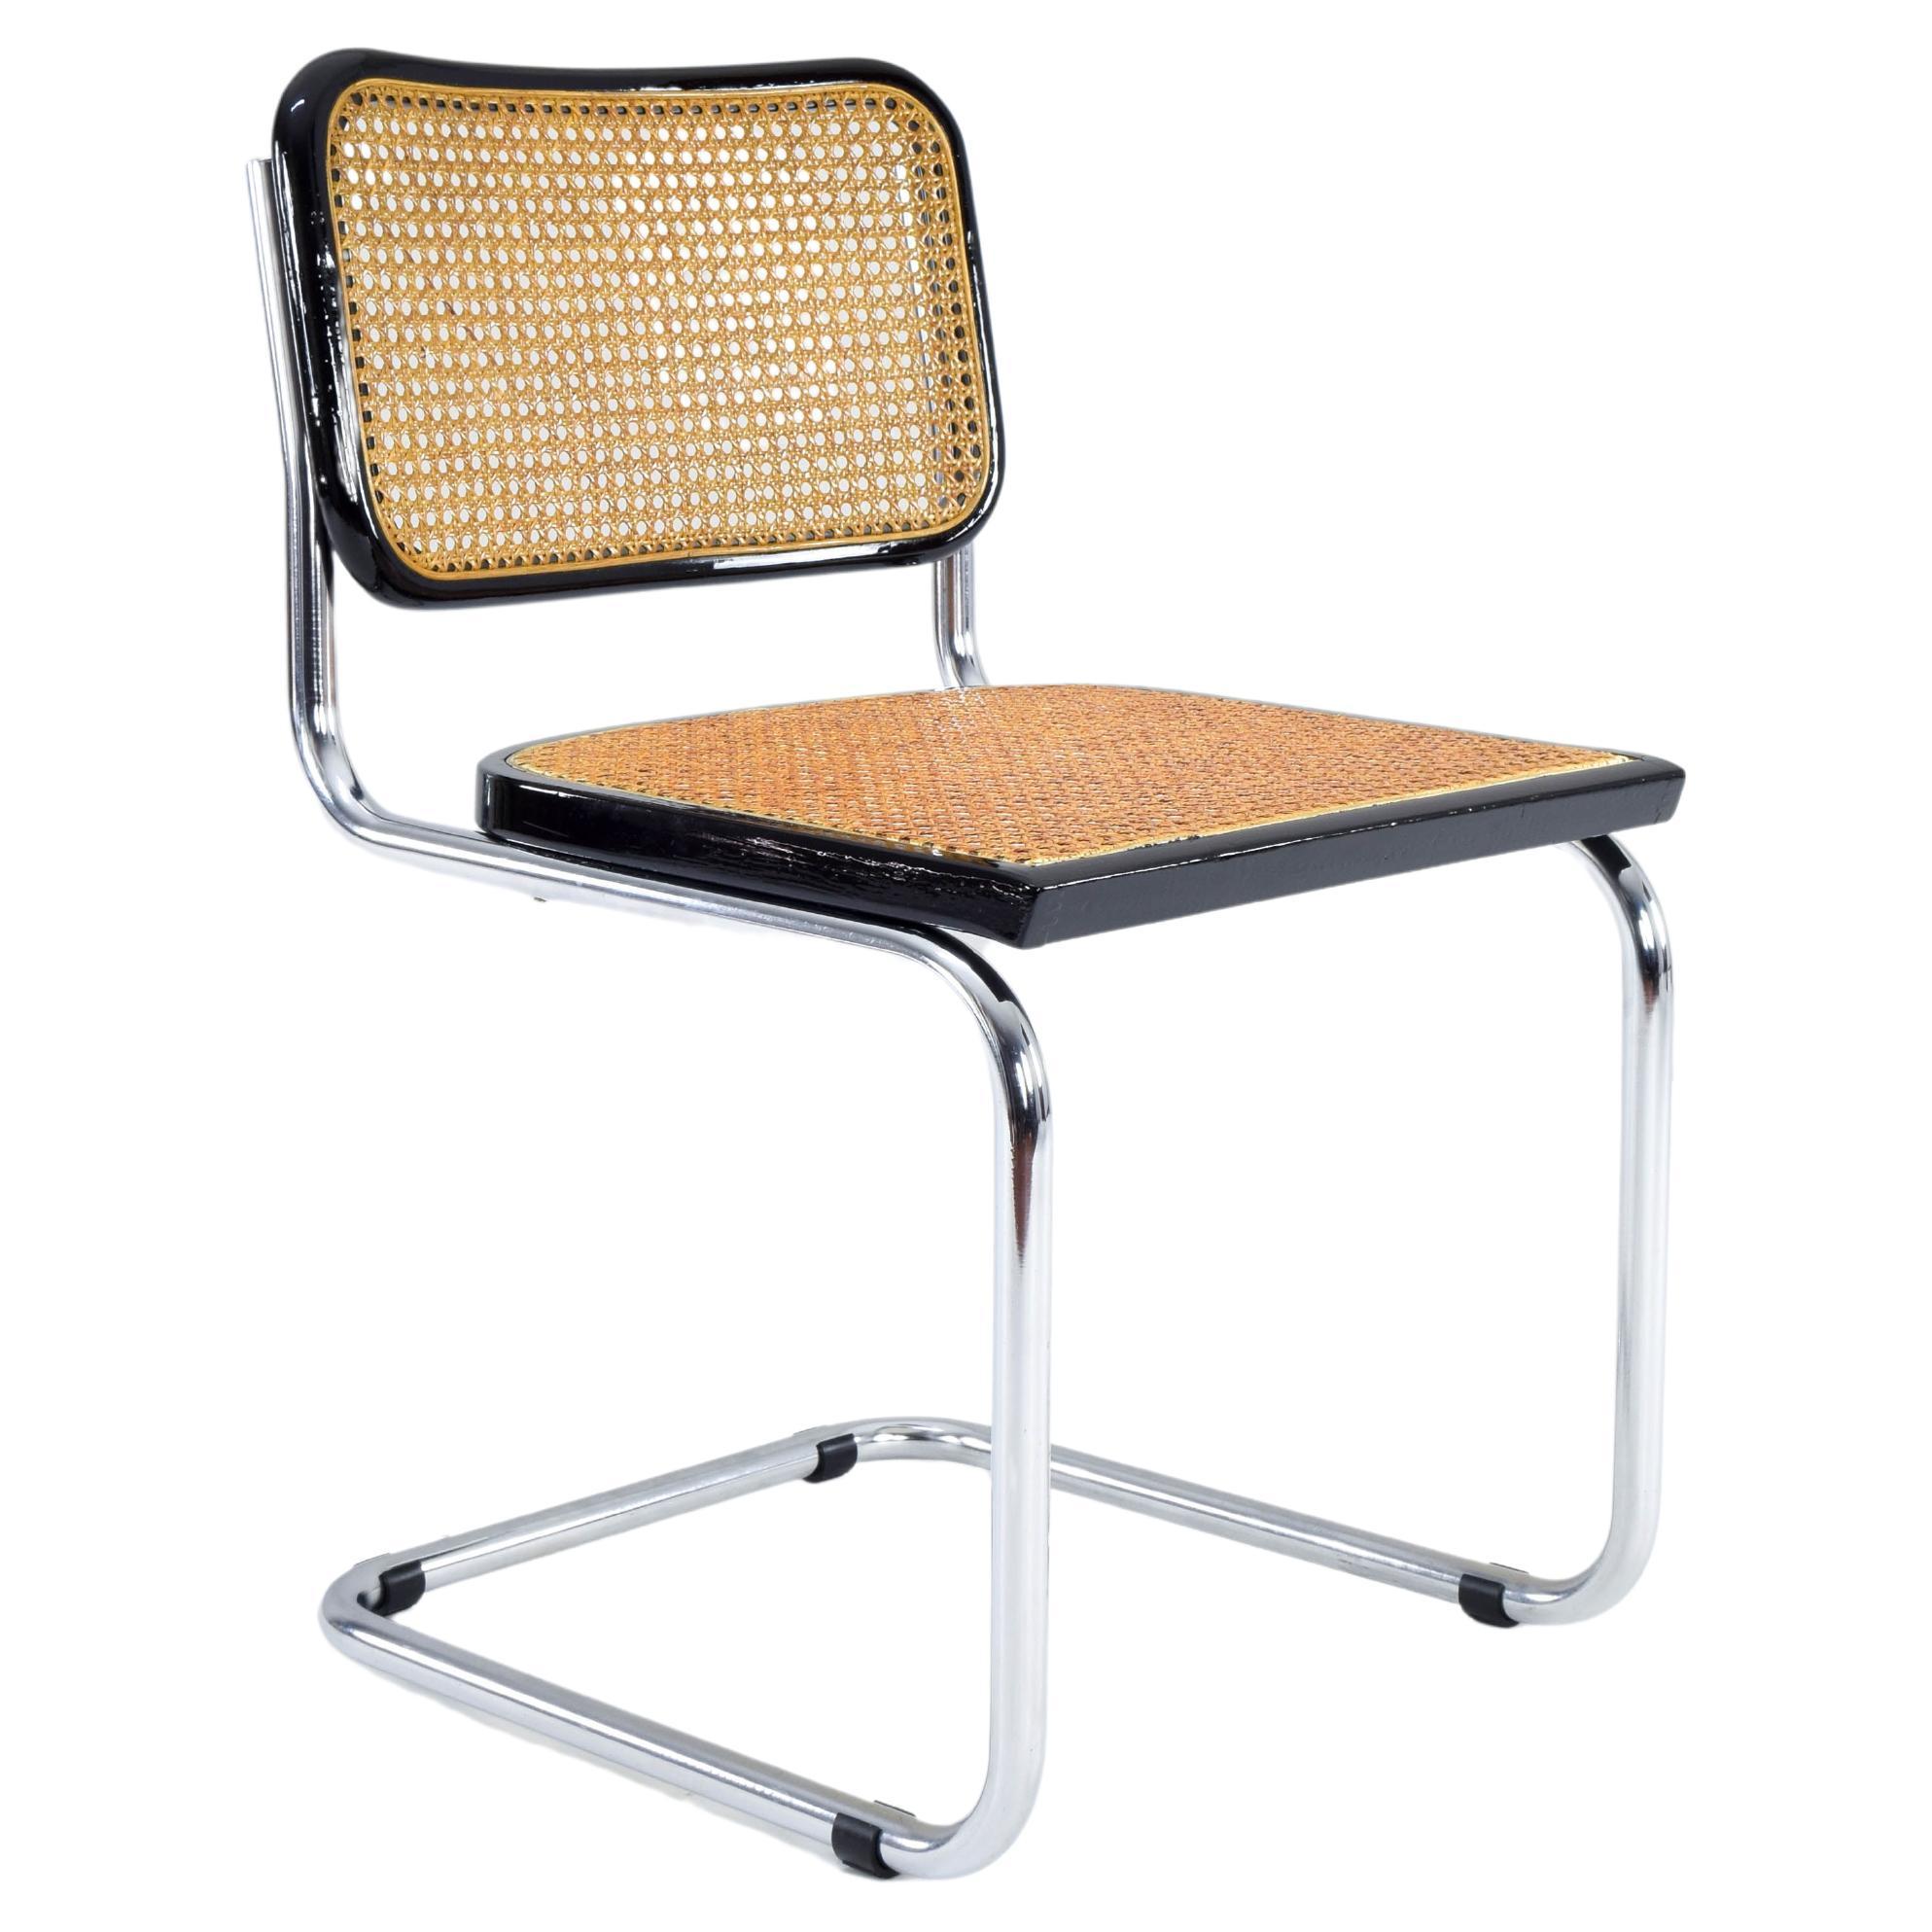 Mid-Century Modern Italian Marcel Breuer B32 Cesca Chair, 70s